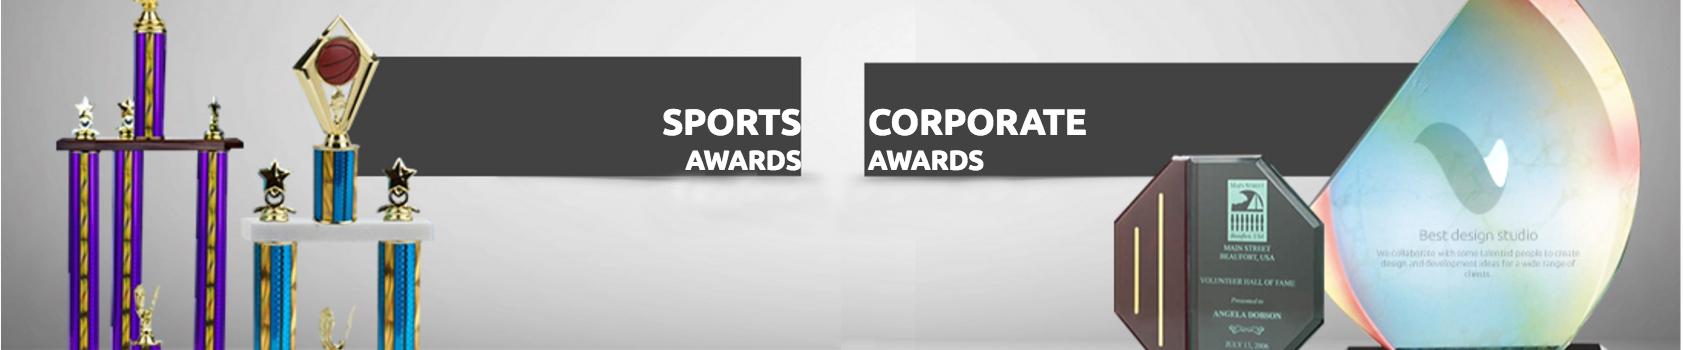 AwardsForAnything - Trophies - Awards - Sports - Corporate